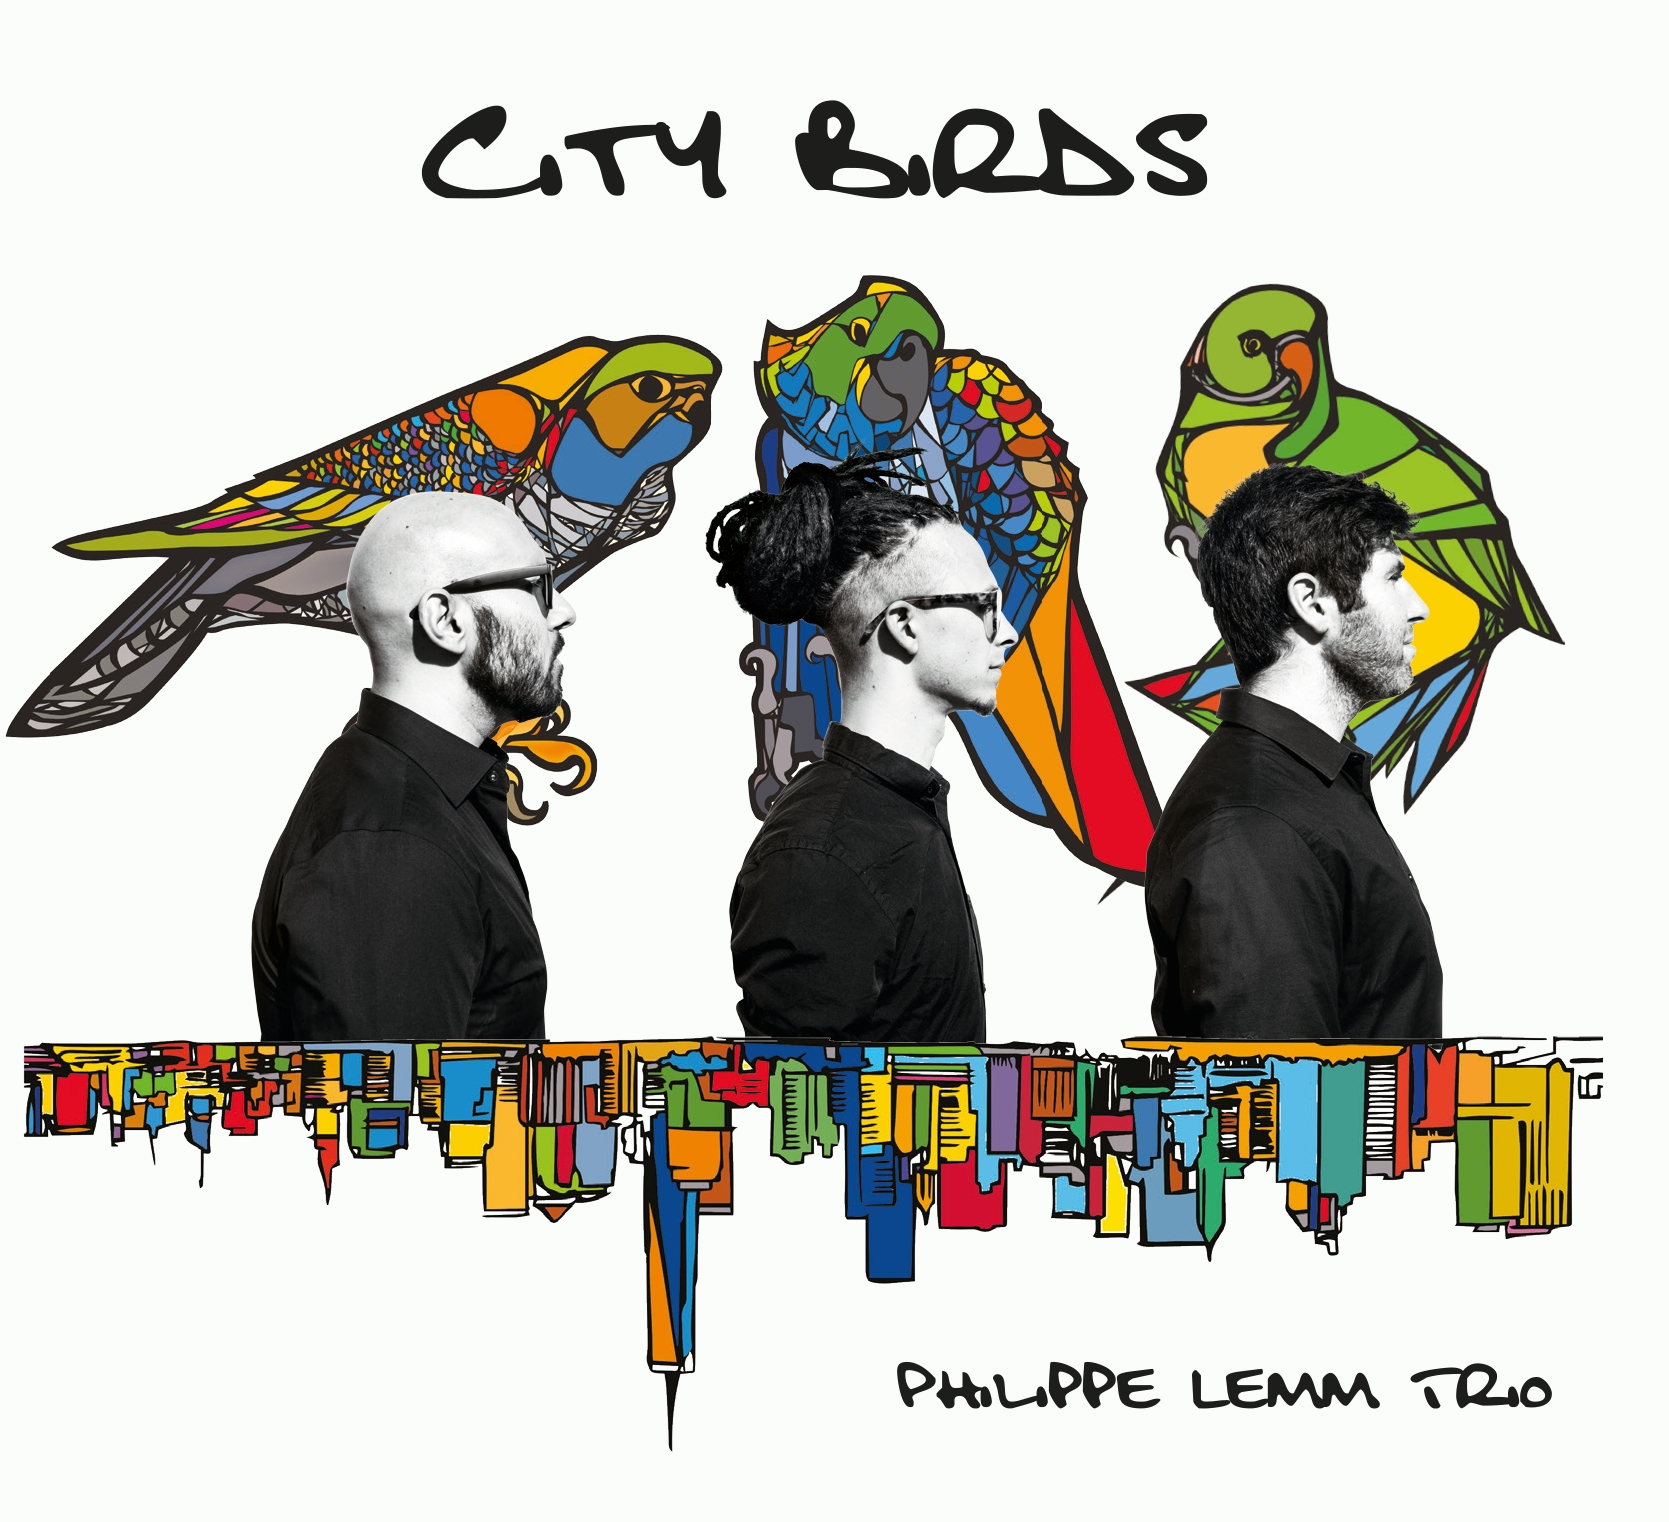 Philippe Lemm Trio City BIrds.jpg